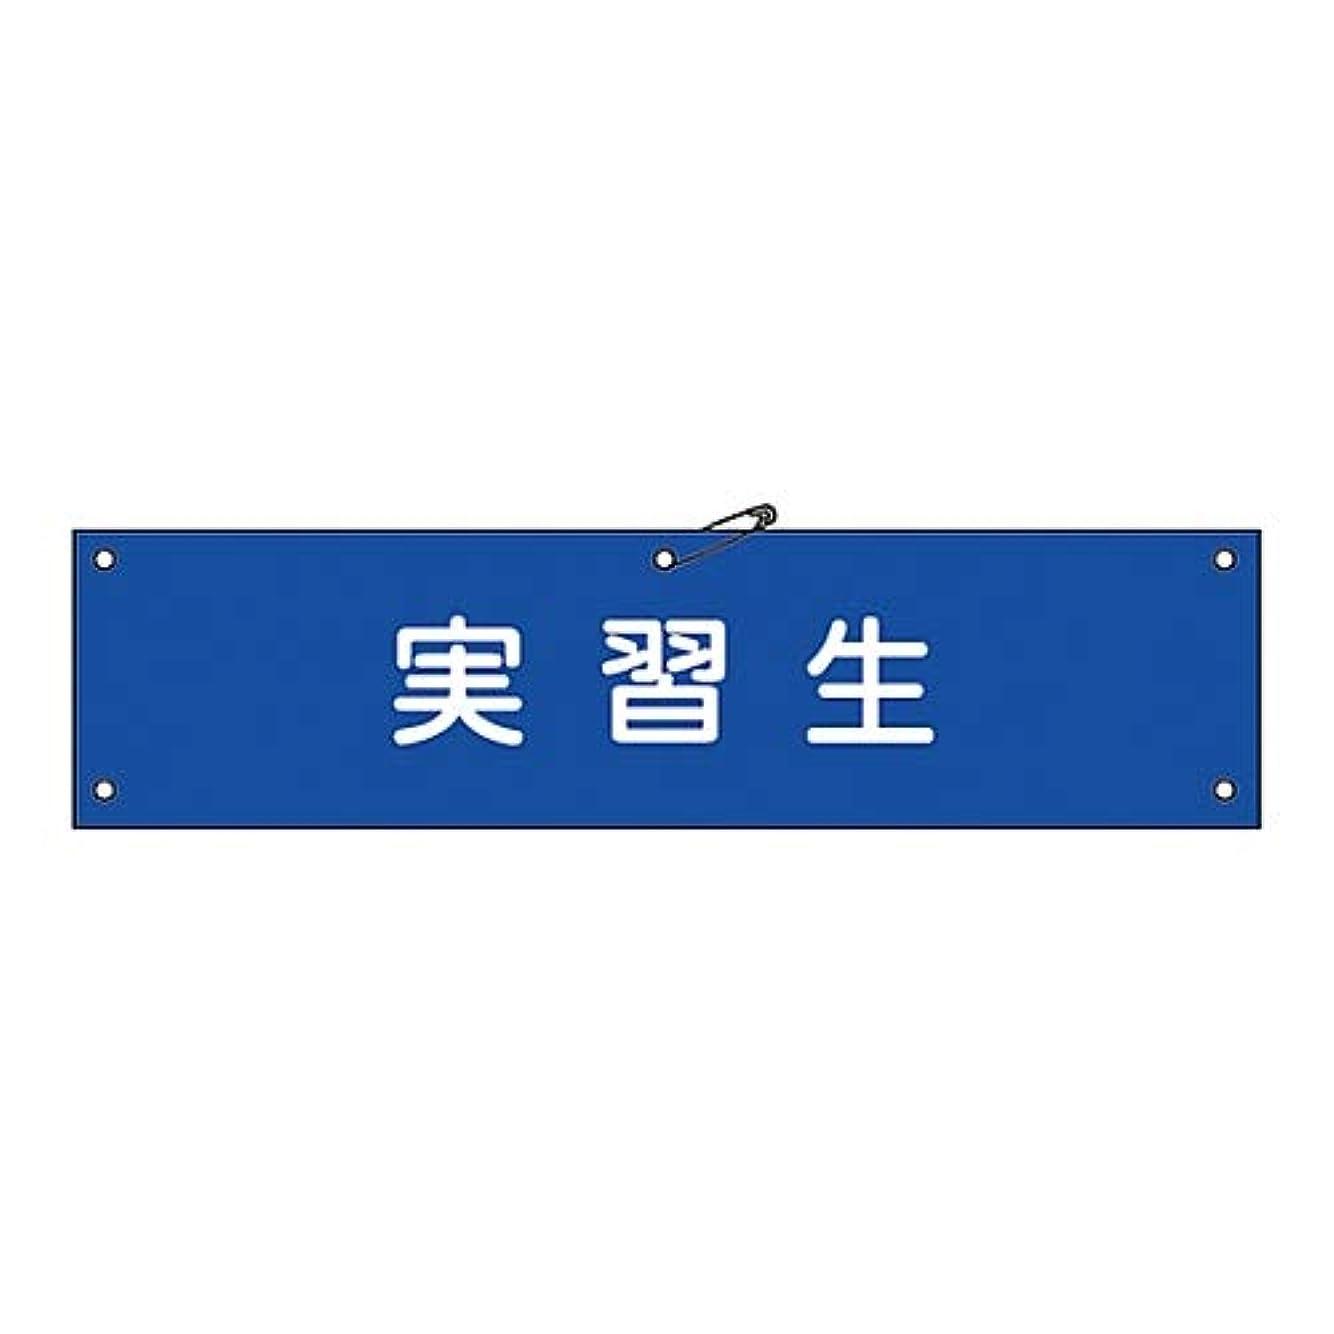 発生器容器リゾート腕章 「実習生」 腕章-32A/61-3424-36